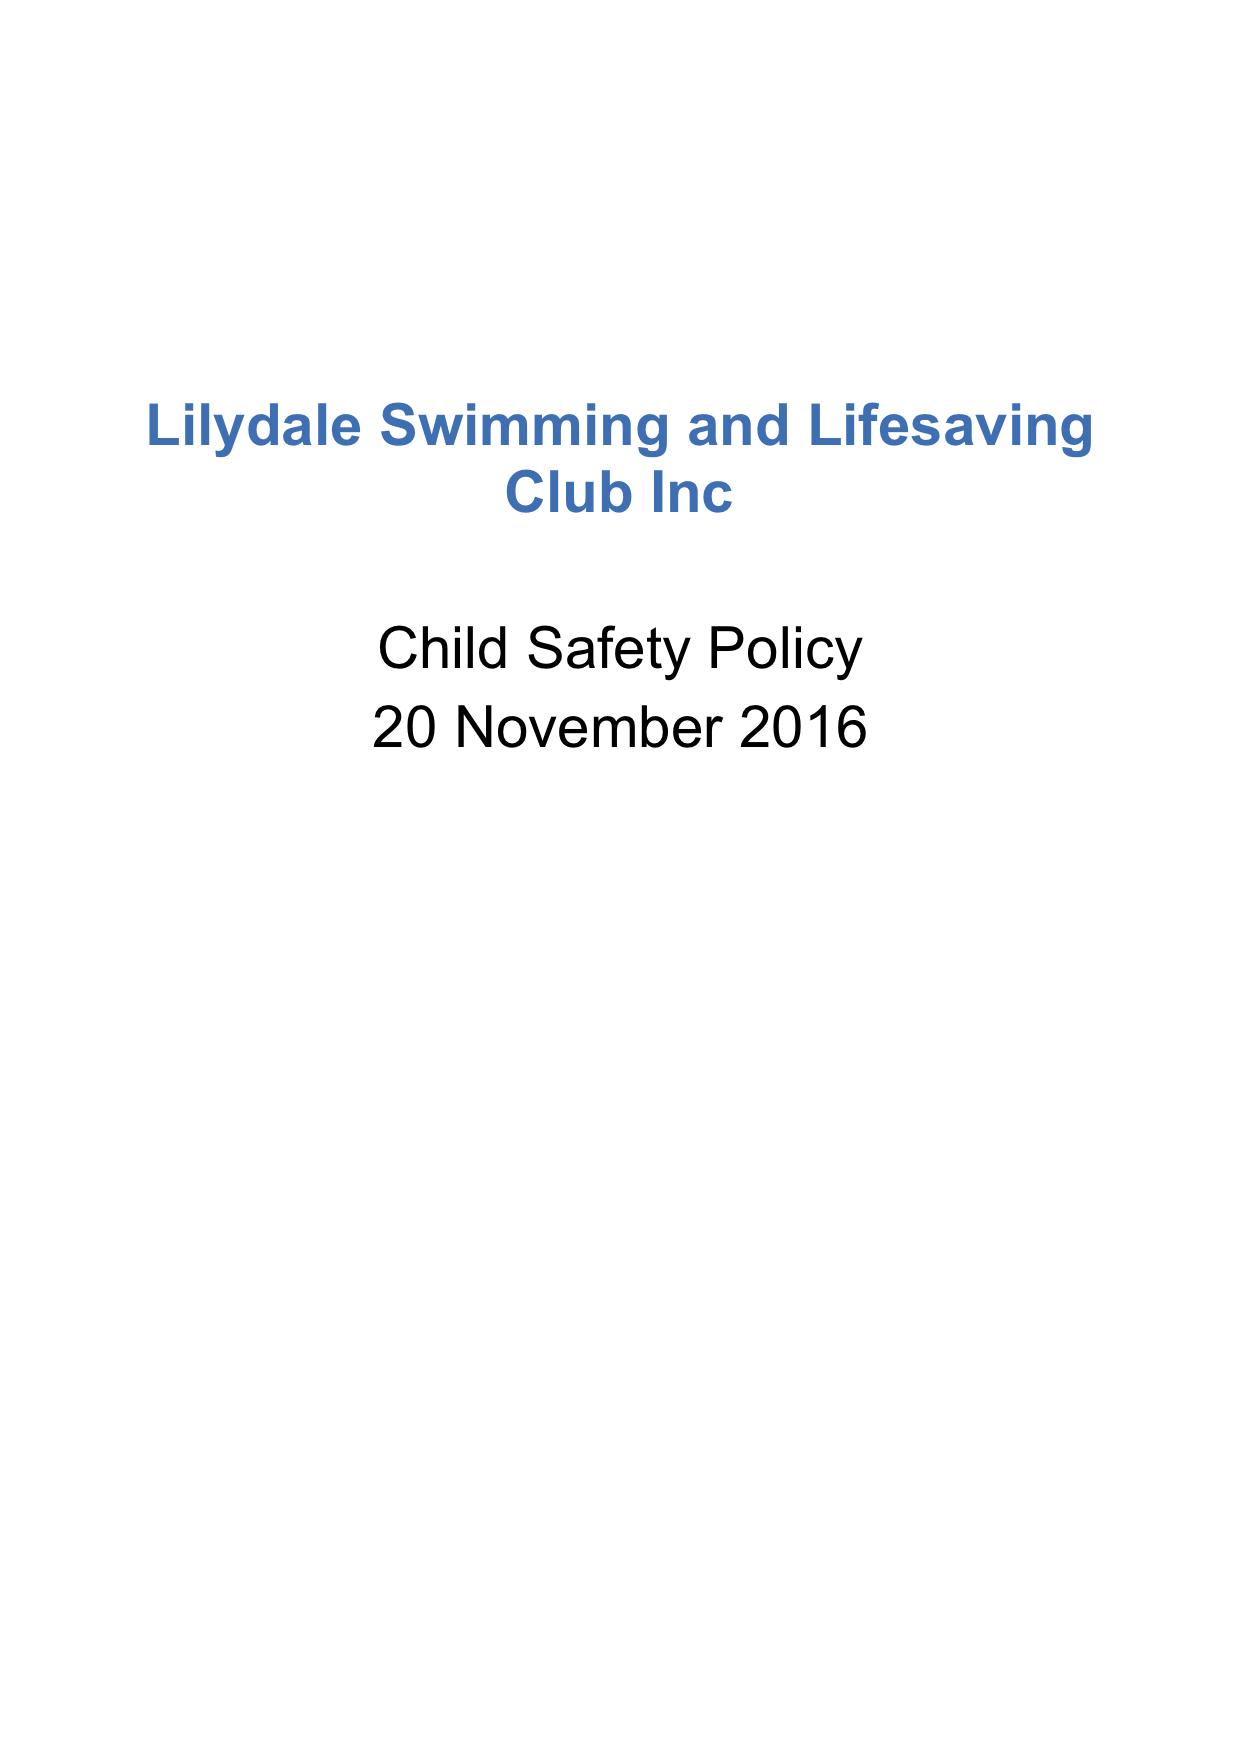 LSC Child Safety Policy 20-11-16 pg1.jpg